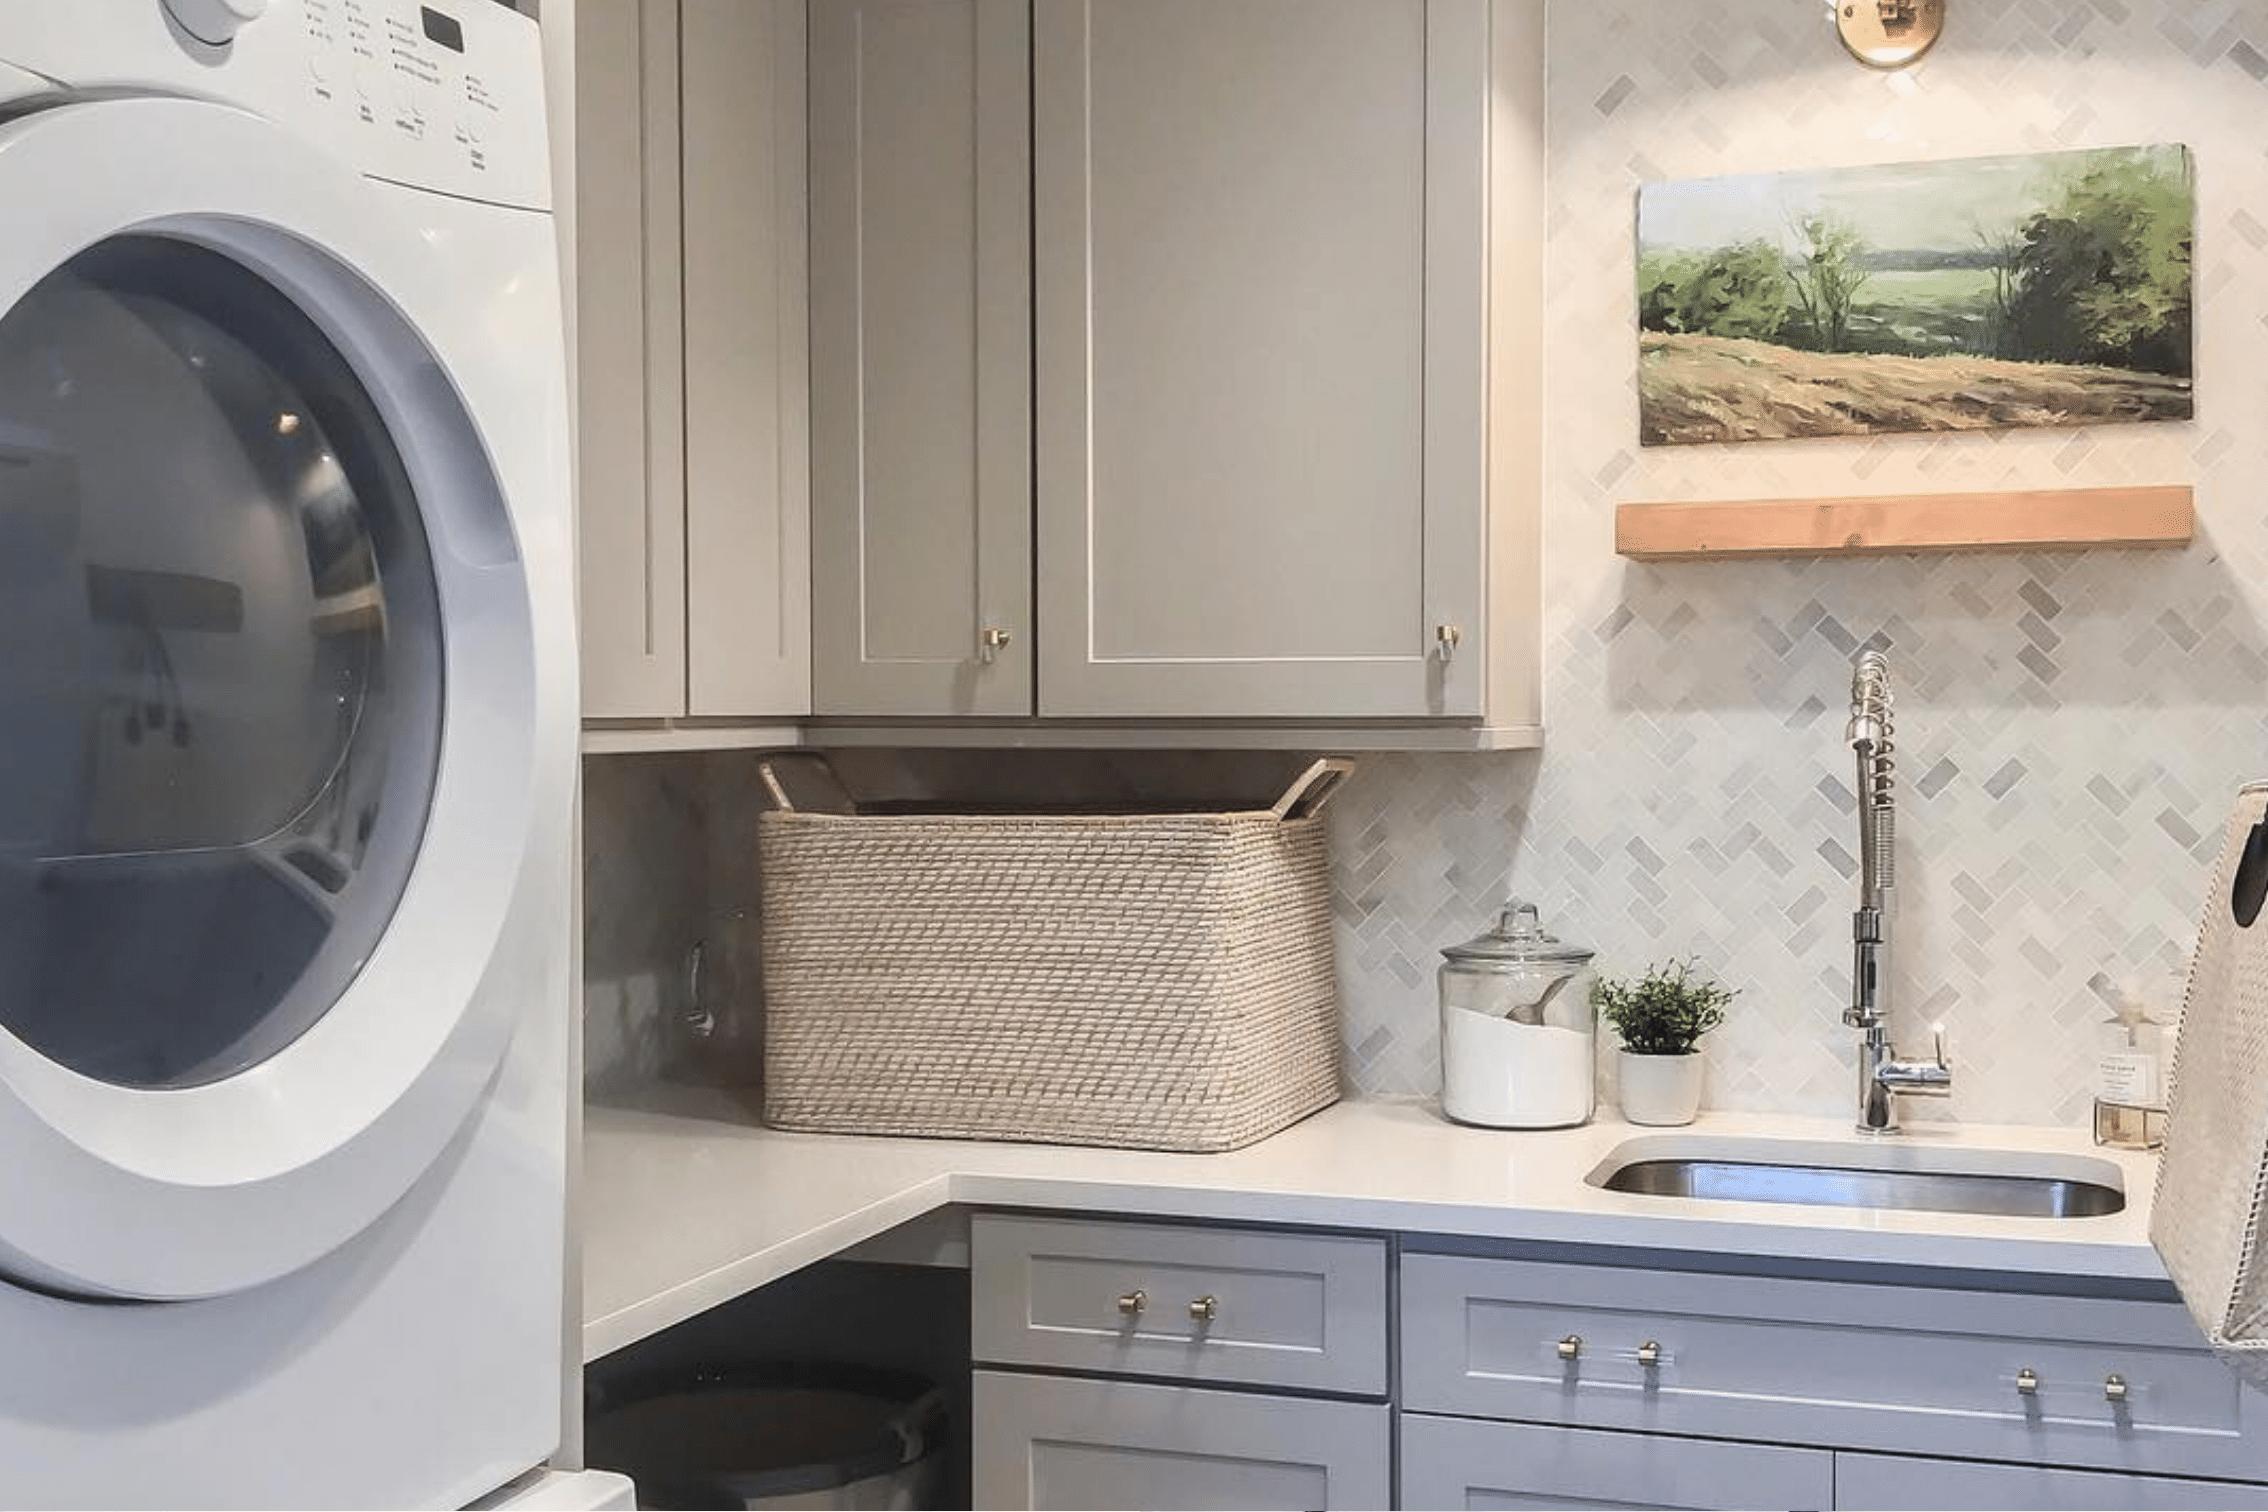 Washroom Sink and Laundry